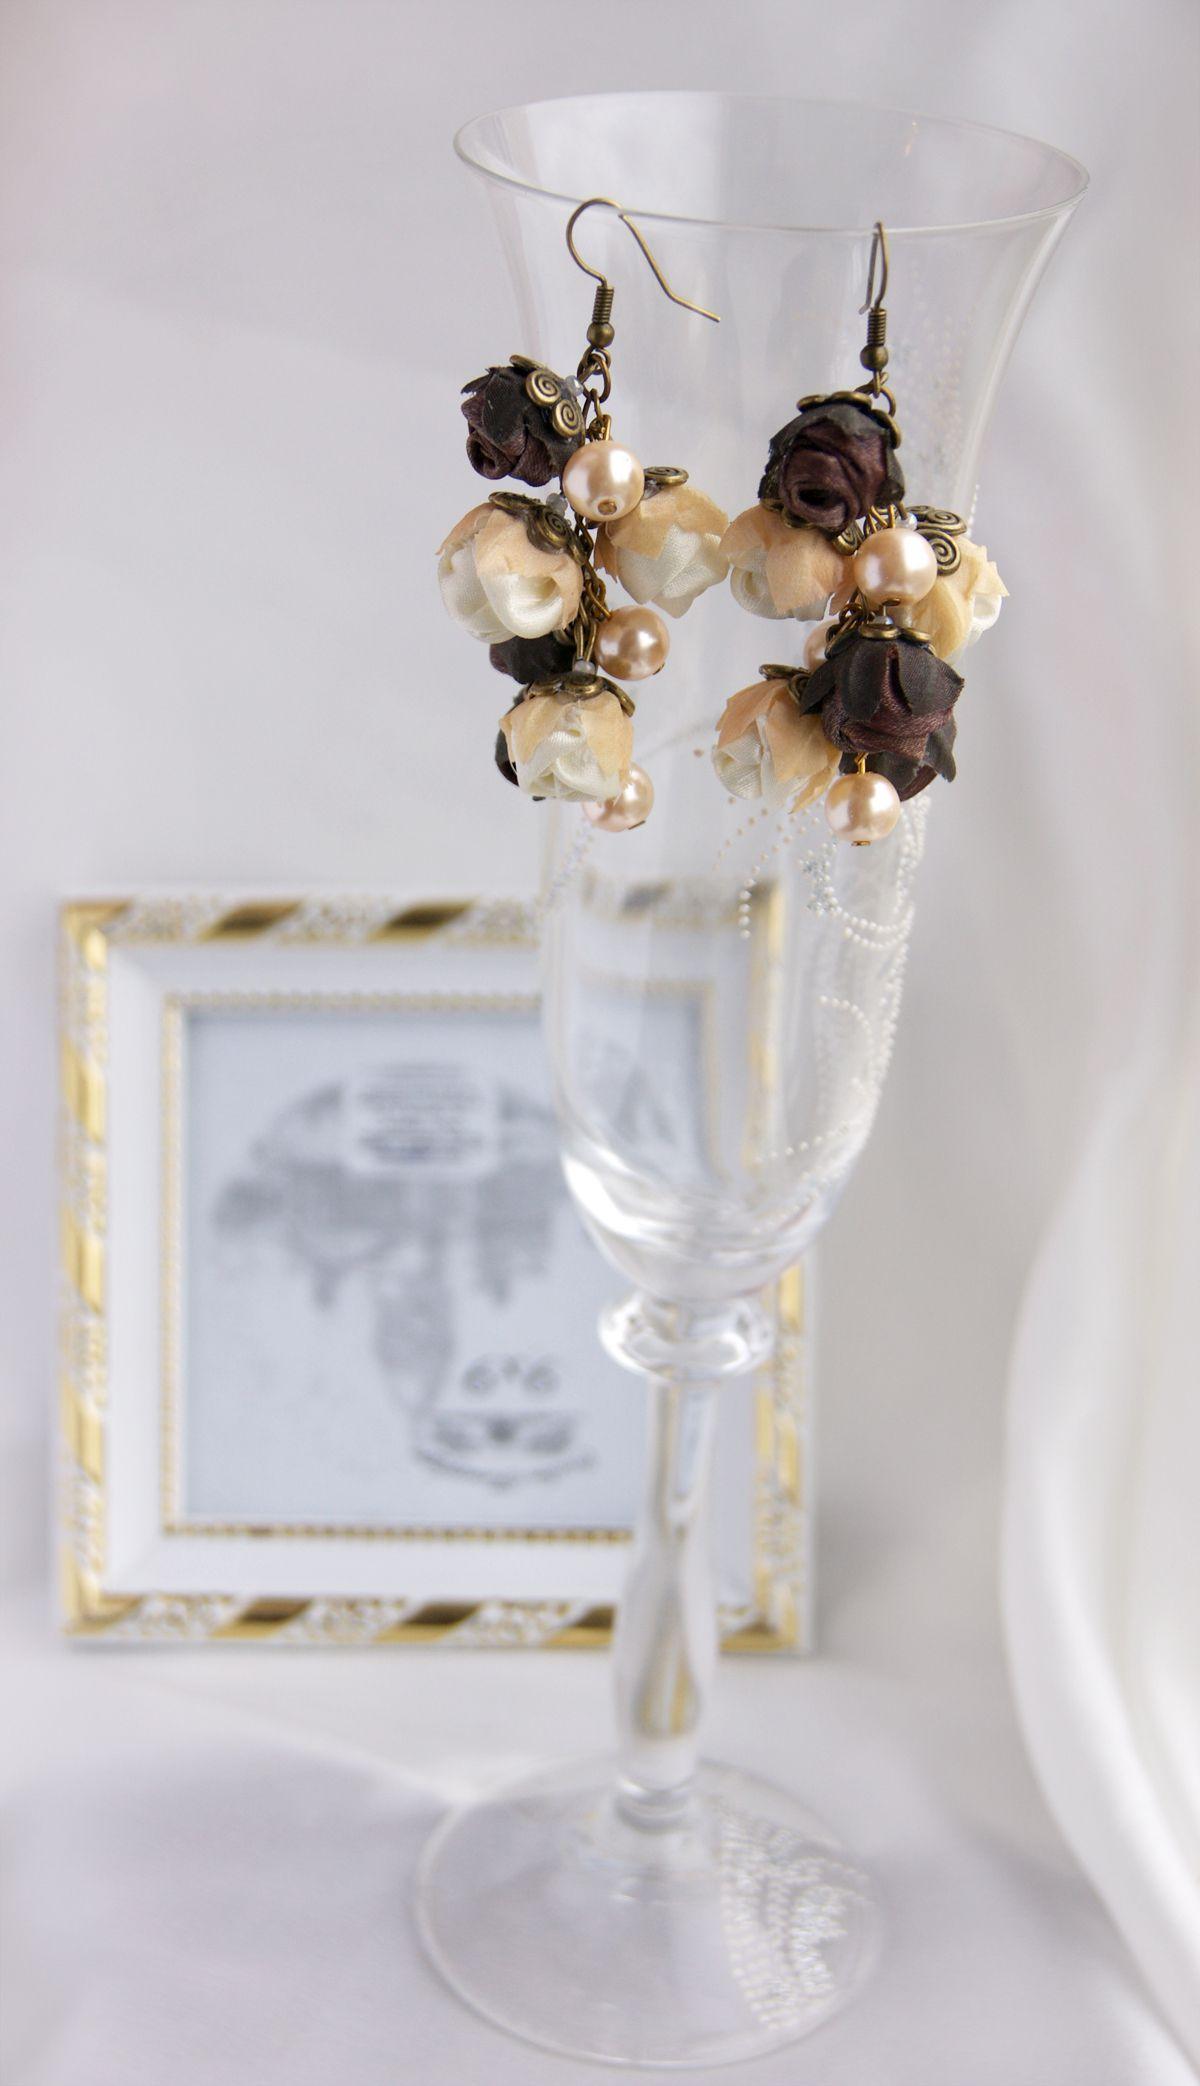 accessories bronze present earrings satin